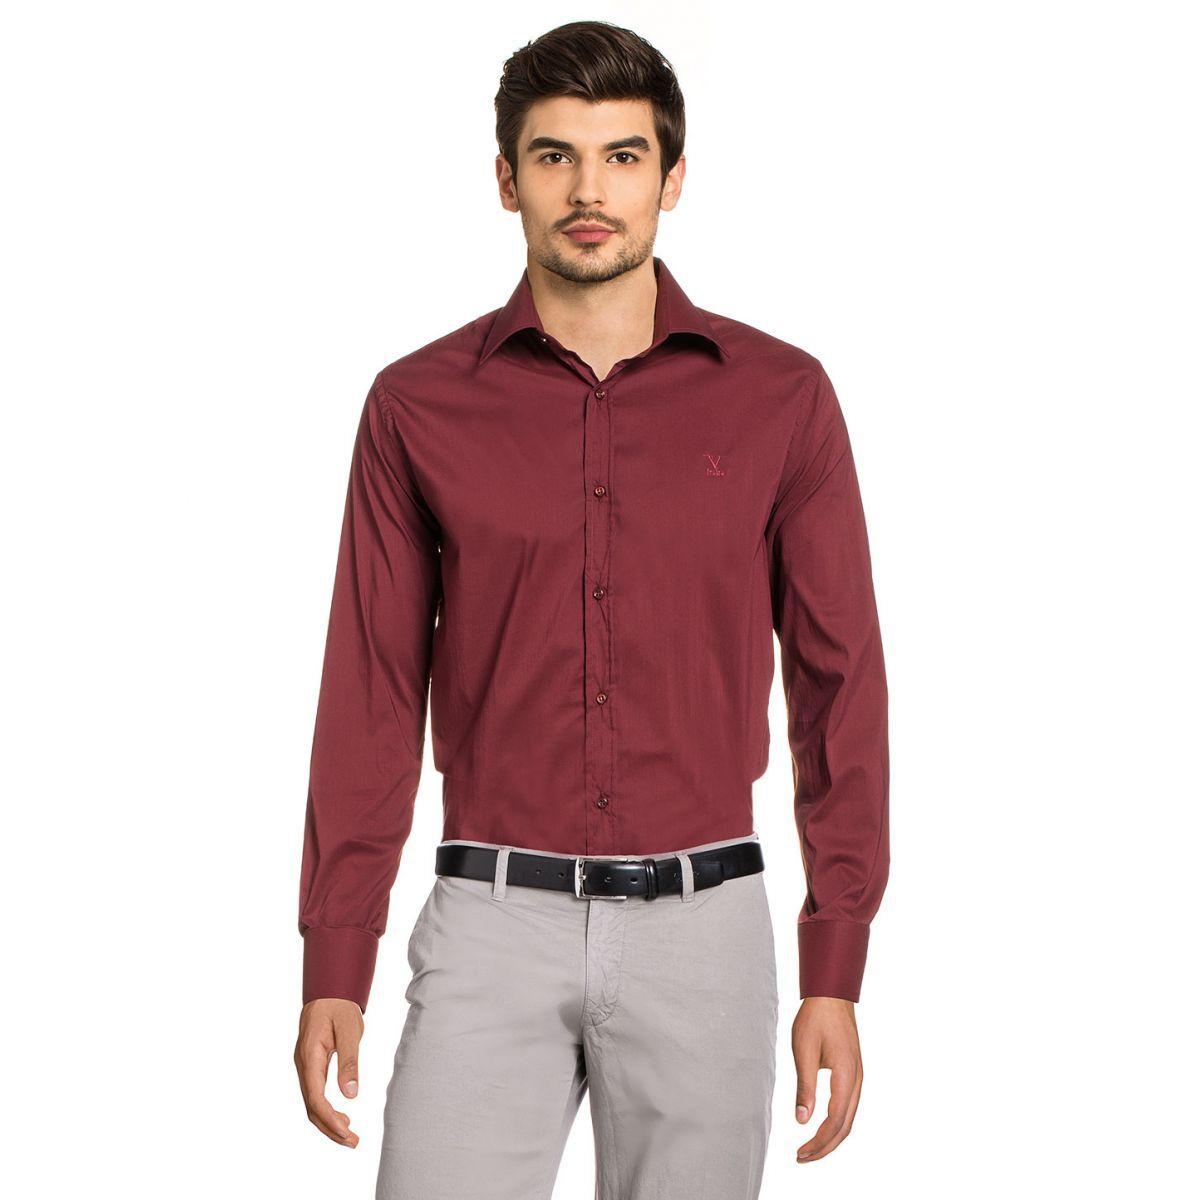 Versace 19.69 Abbigliamento Sportivo Srl Milano Italia Mens Fit Modern Classic Shirt 377 ART. 12